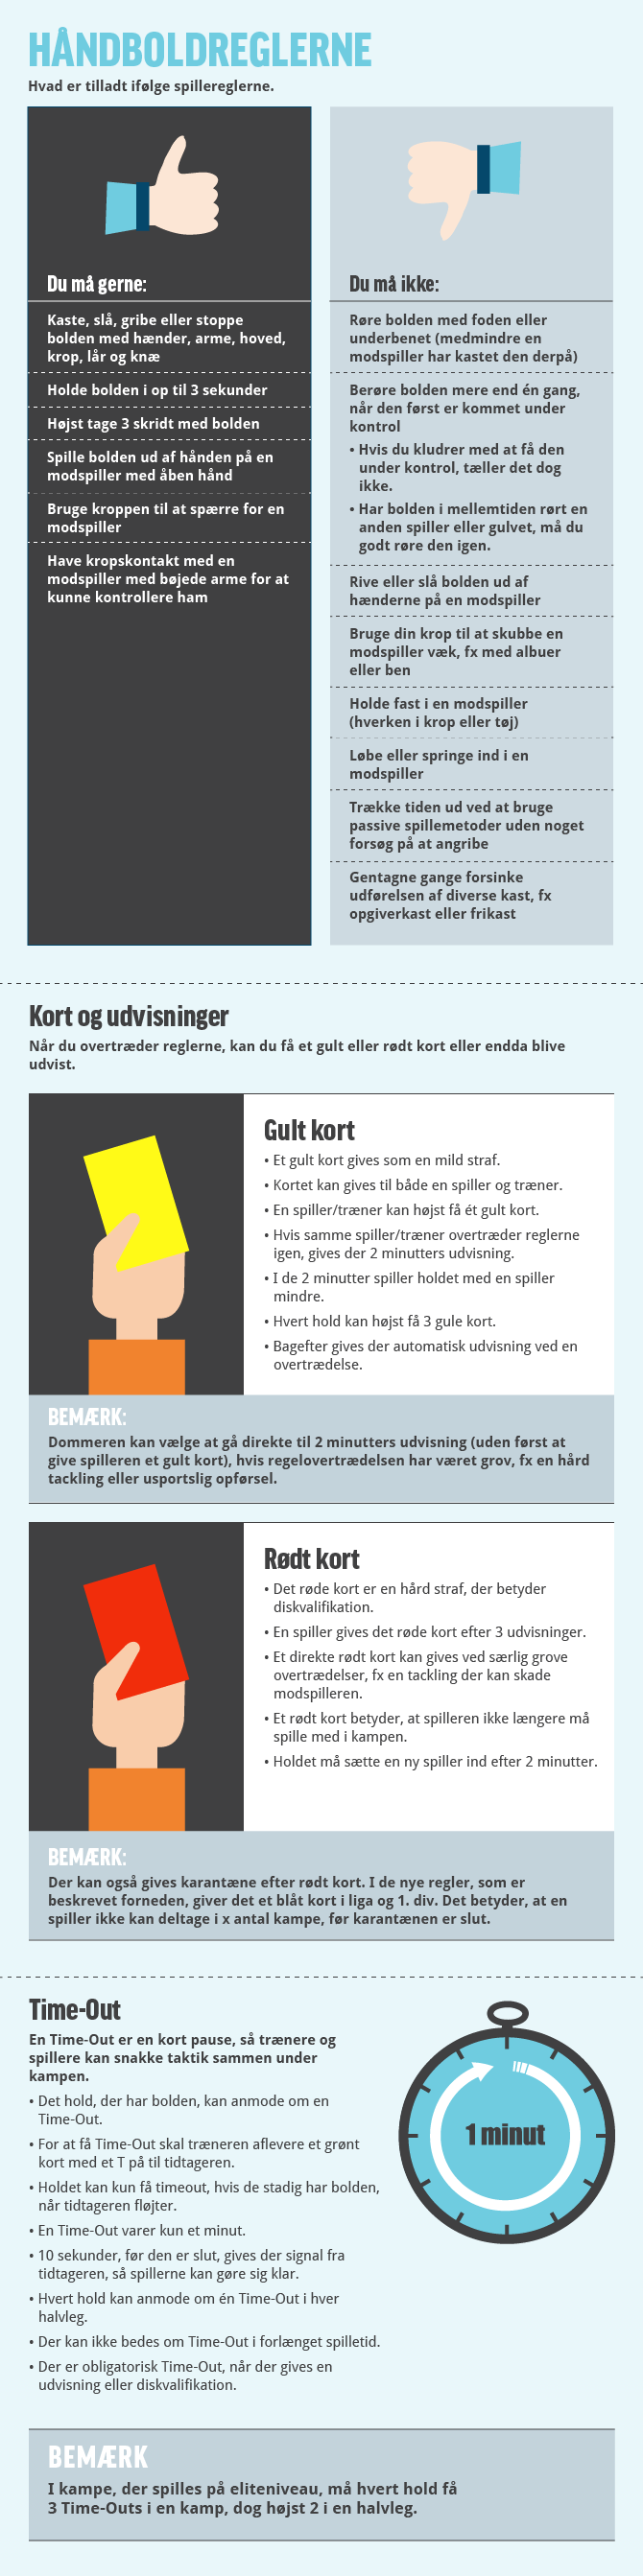 Håndboldreglerne - gult kort - rødt kort - timeout